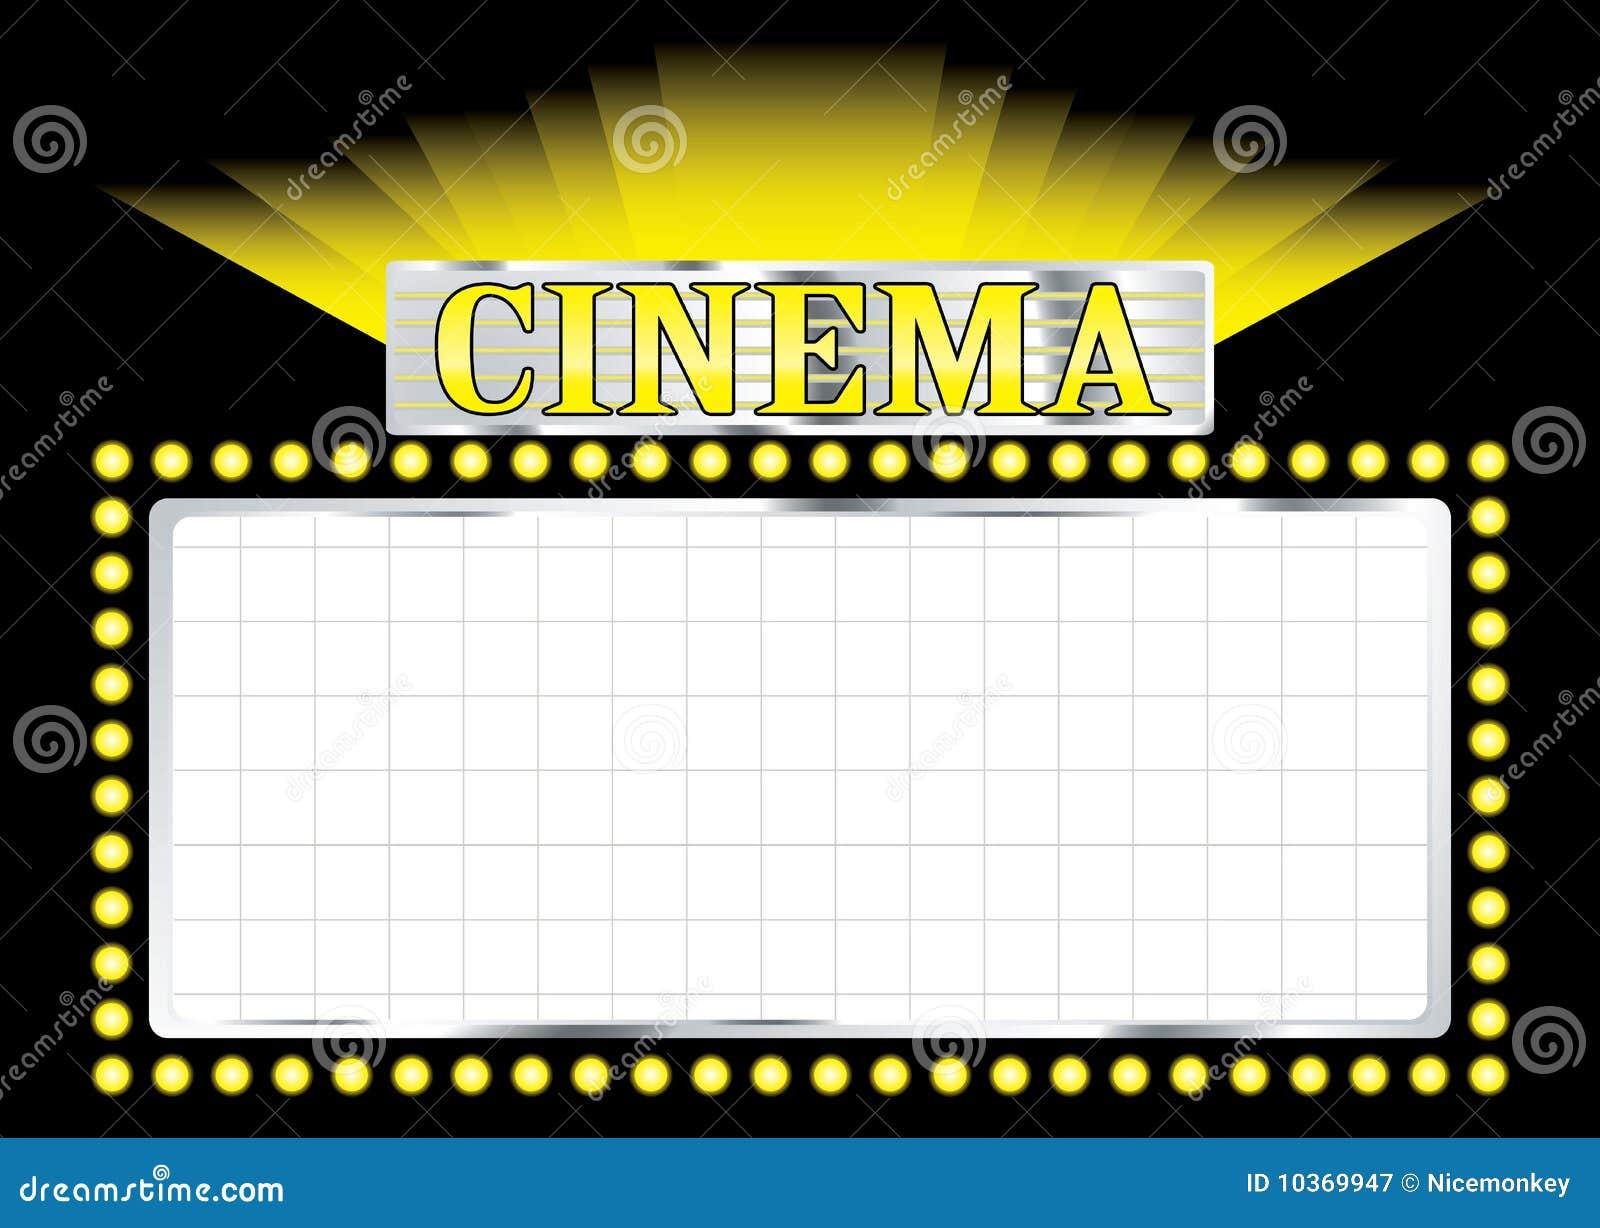 deco cinema stock vector image of neon advertisement 10369947. Black Bedroom Furniture Sets. Home Design Ideas